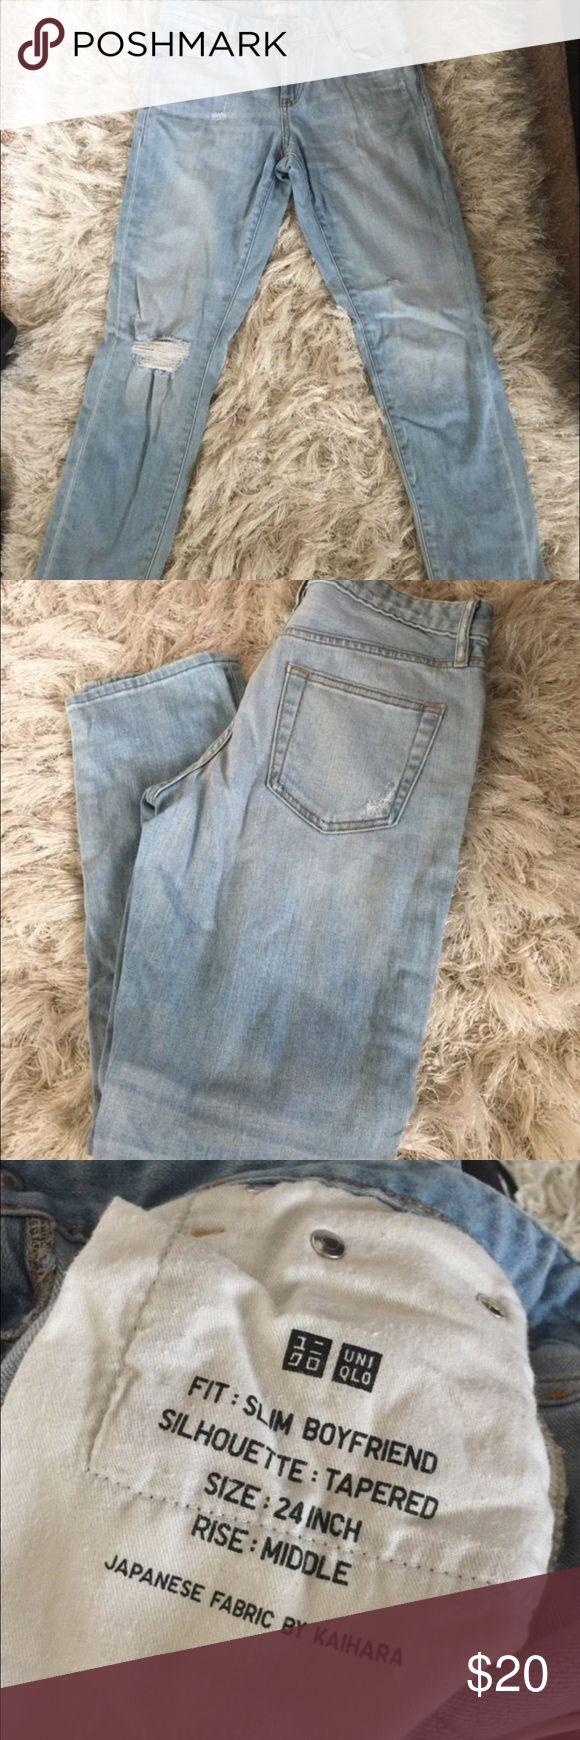 Women's uniqlo boyfriend jeans Pre-owned. Excellent condition. Uniqlo Jeans Ankle & Cropped